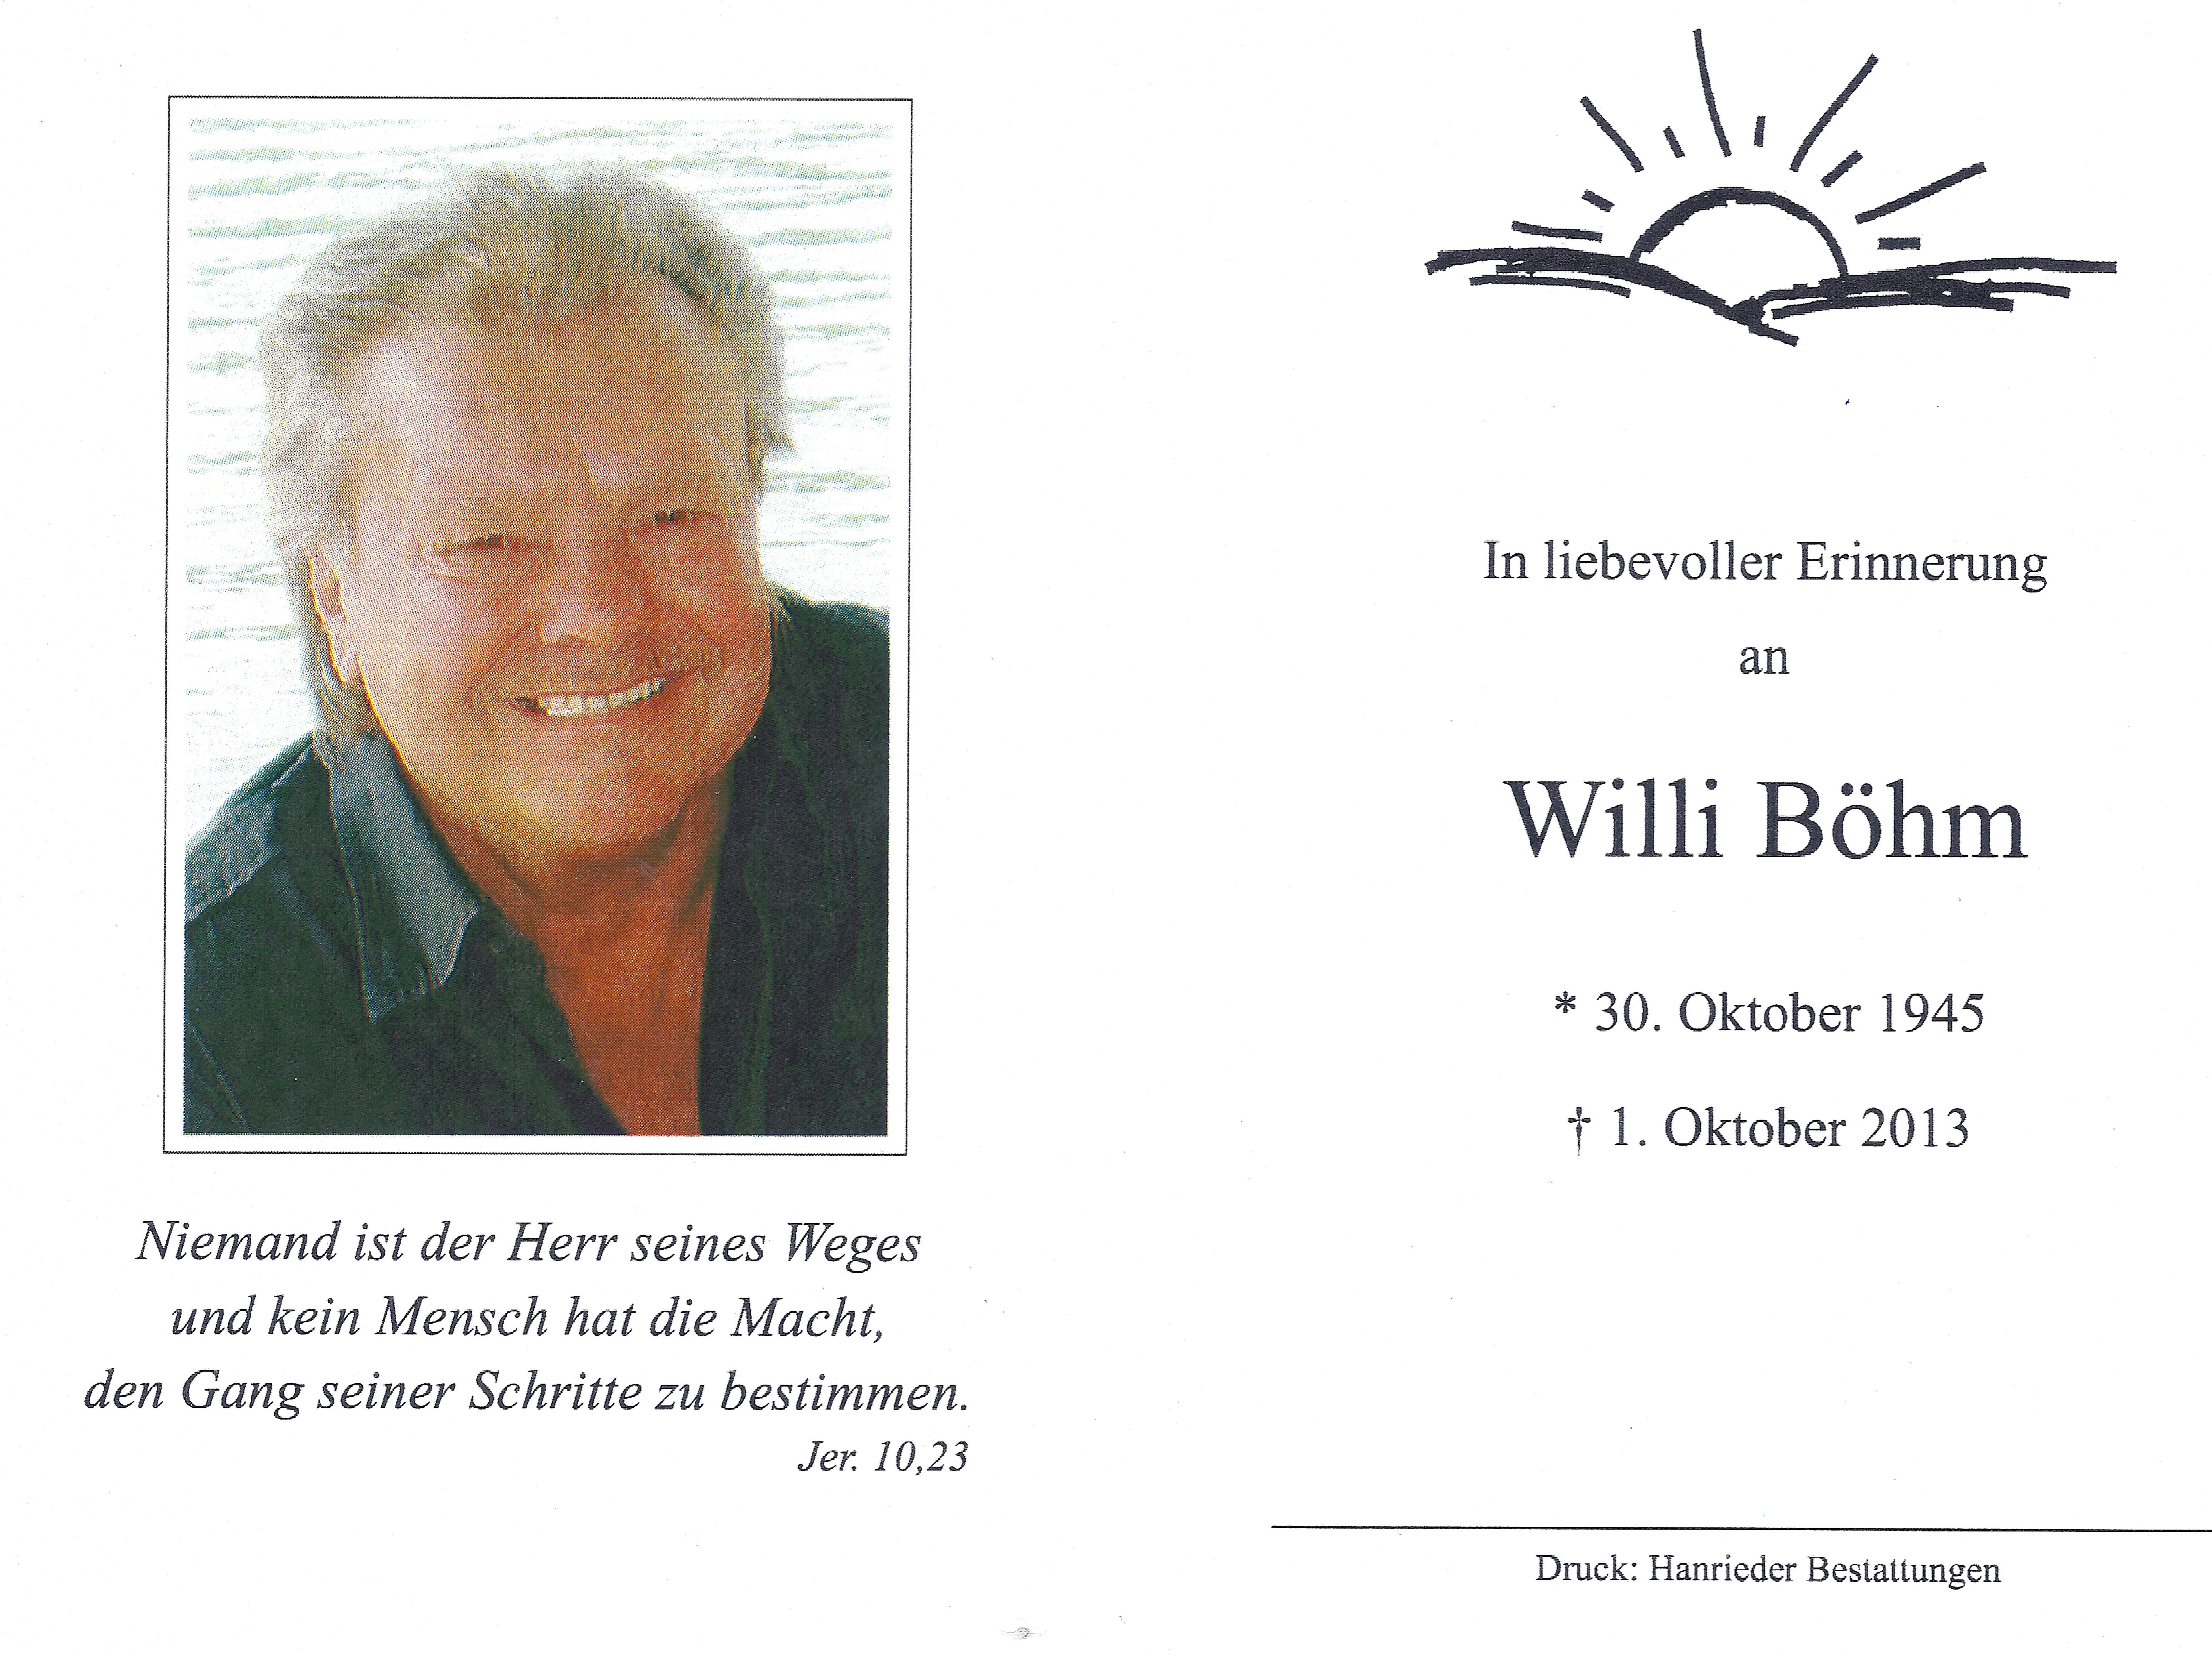 Willi Böhm